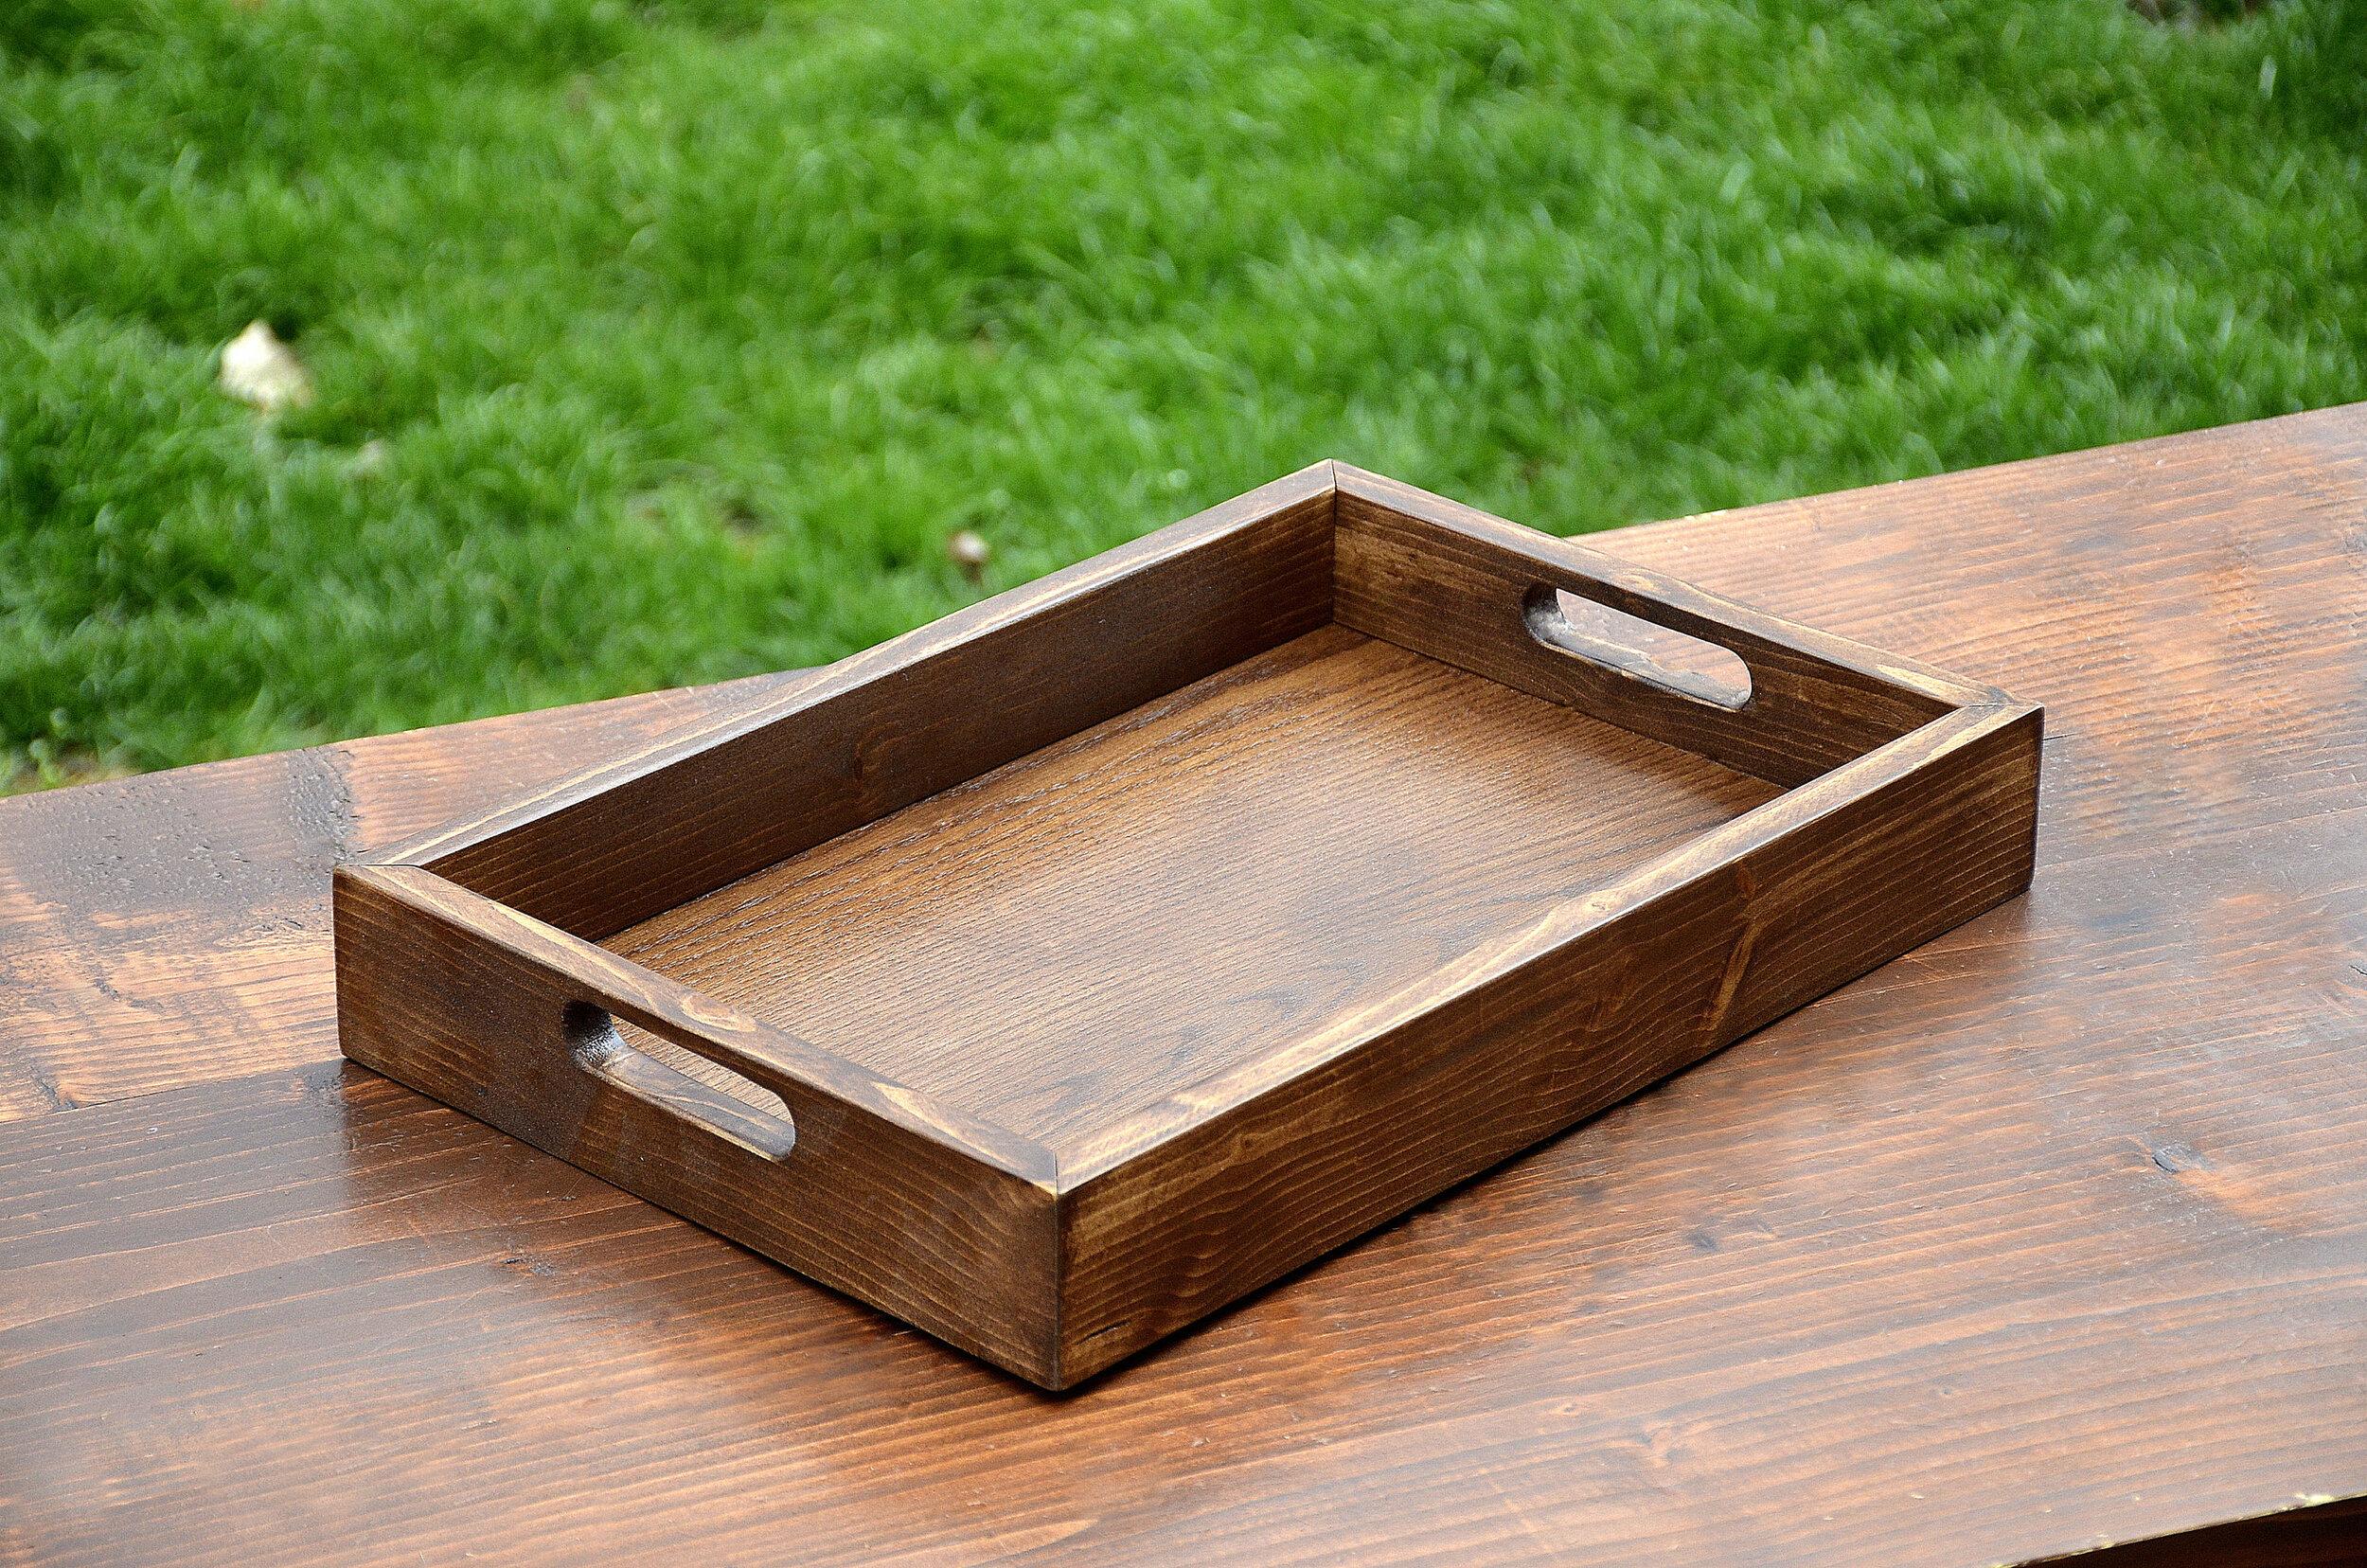 wood tray serving tray coffee table ottoman tray penn rustics